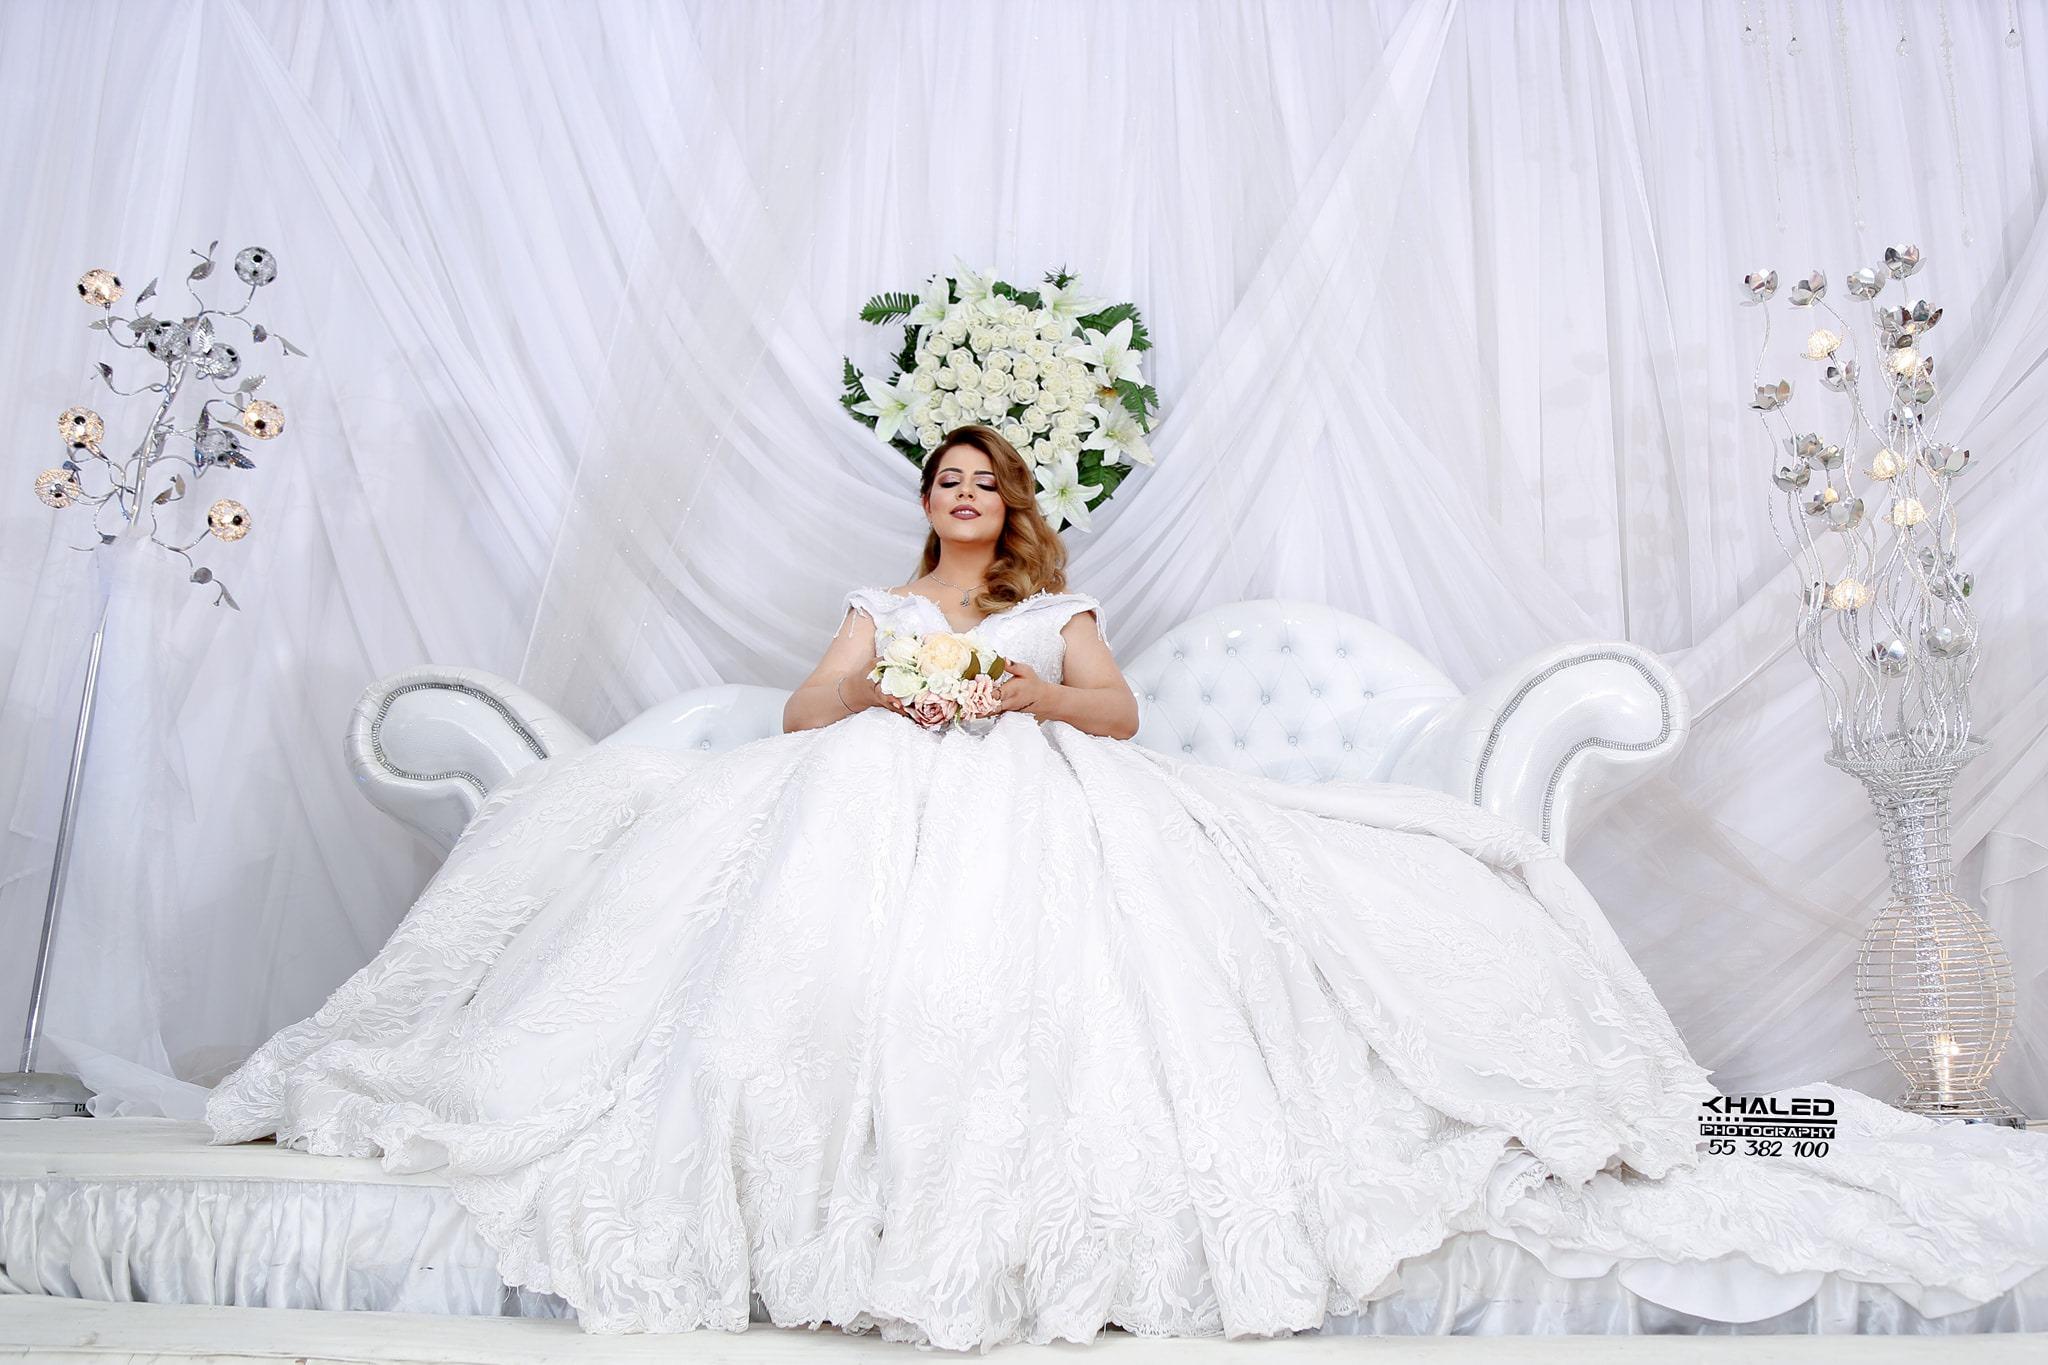 fida13_plus_belles_mariées_tunisiennes_186_2019